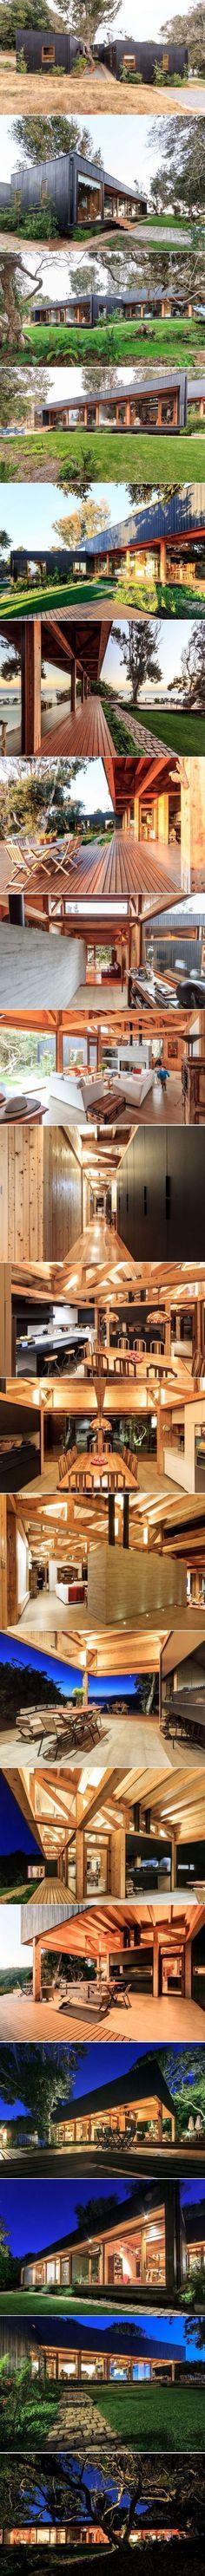 Prado Arquitectos Designs a Cozy Home in Hualpén, Chile | HomeDSGN #ContainerHomeDesigns